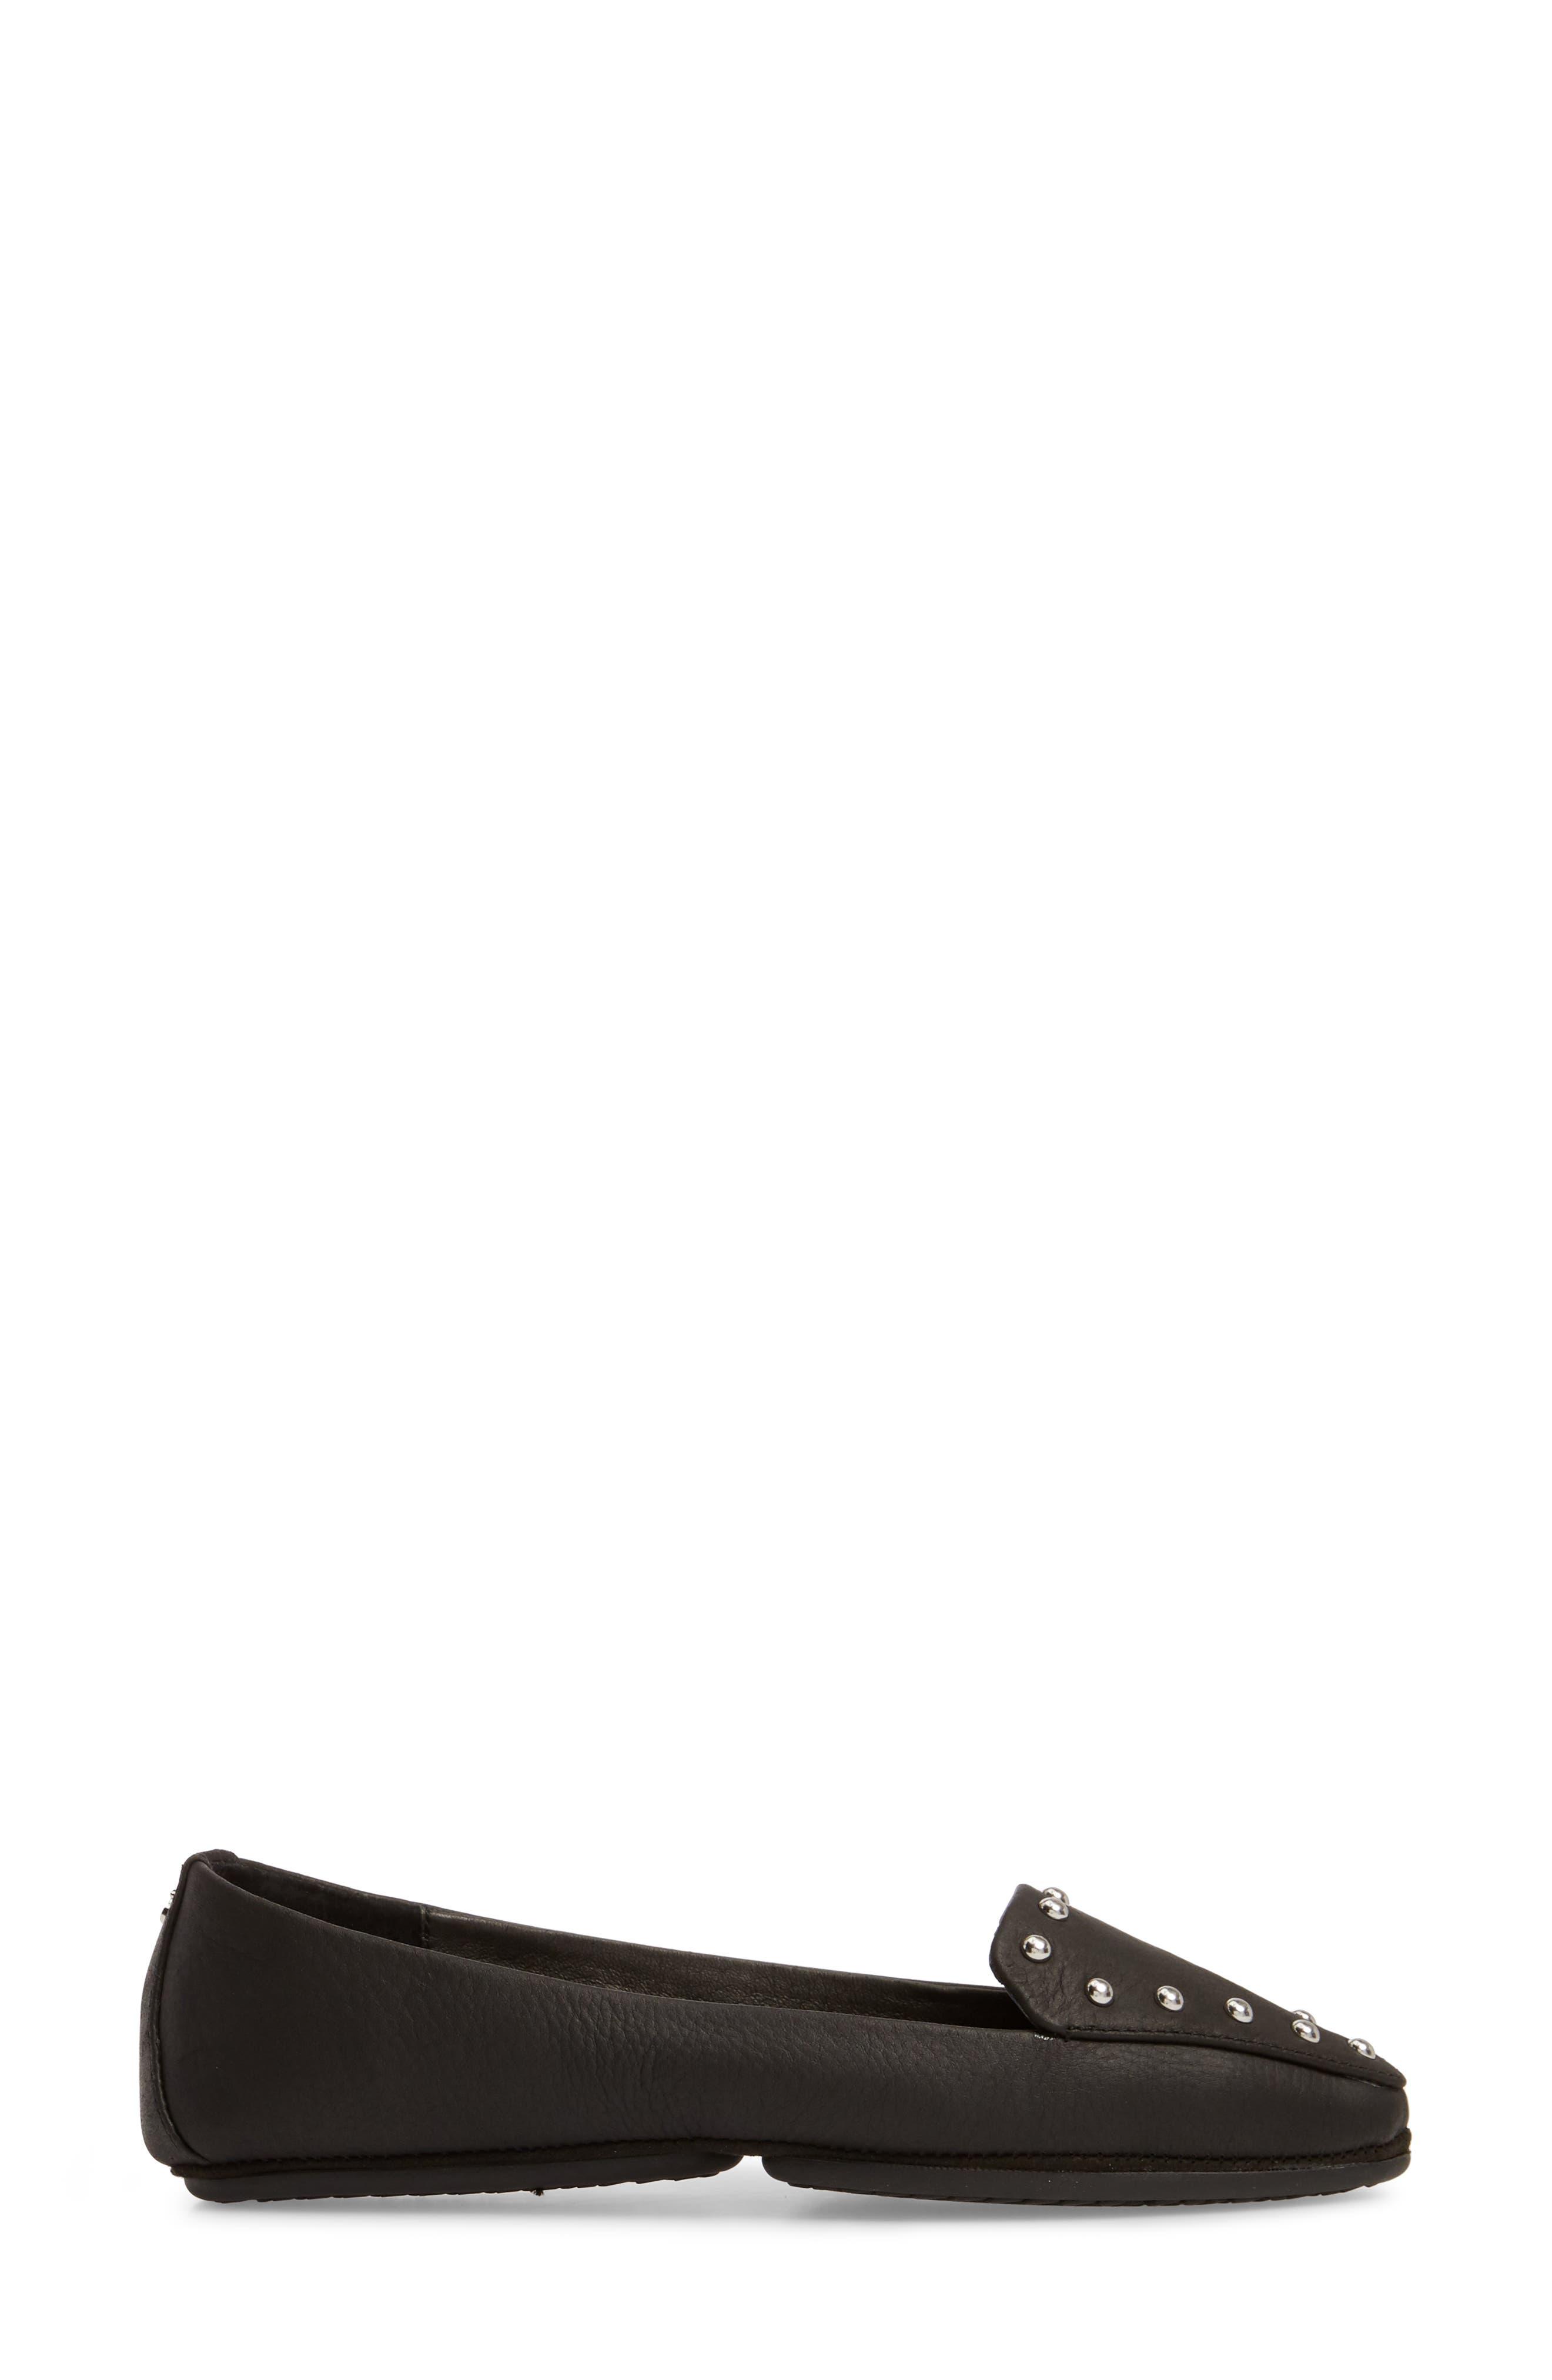 Vera Loafer,                             Alternate thumbnail 3, color,                             Black Stud Leather